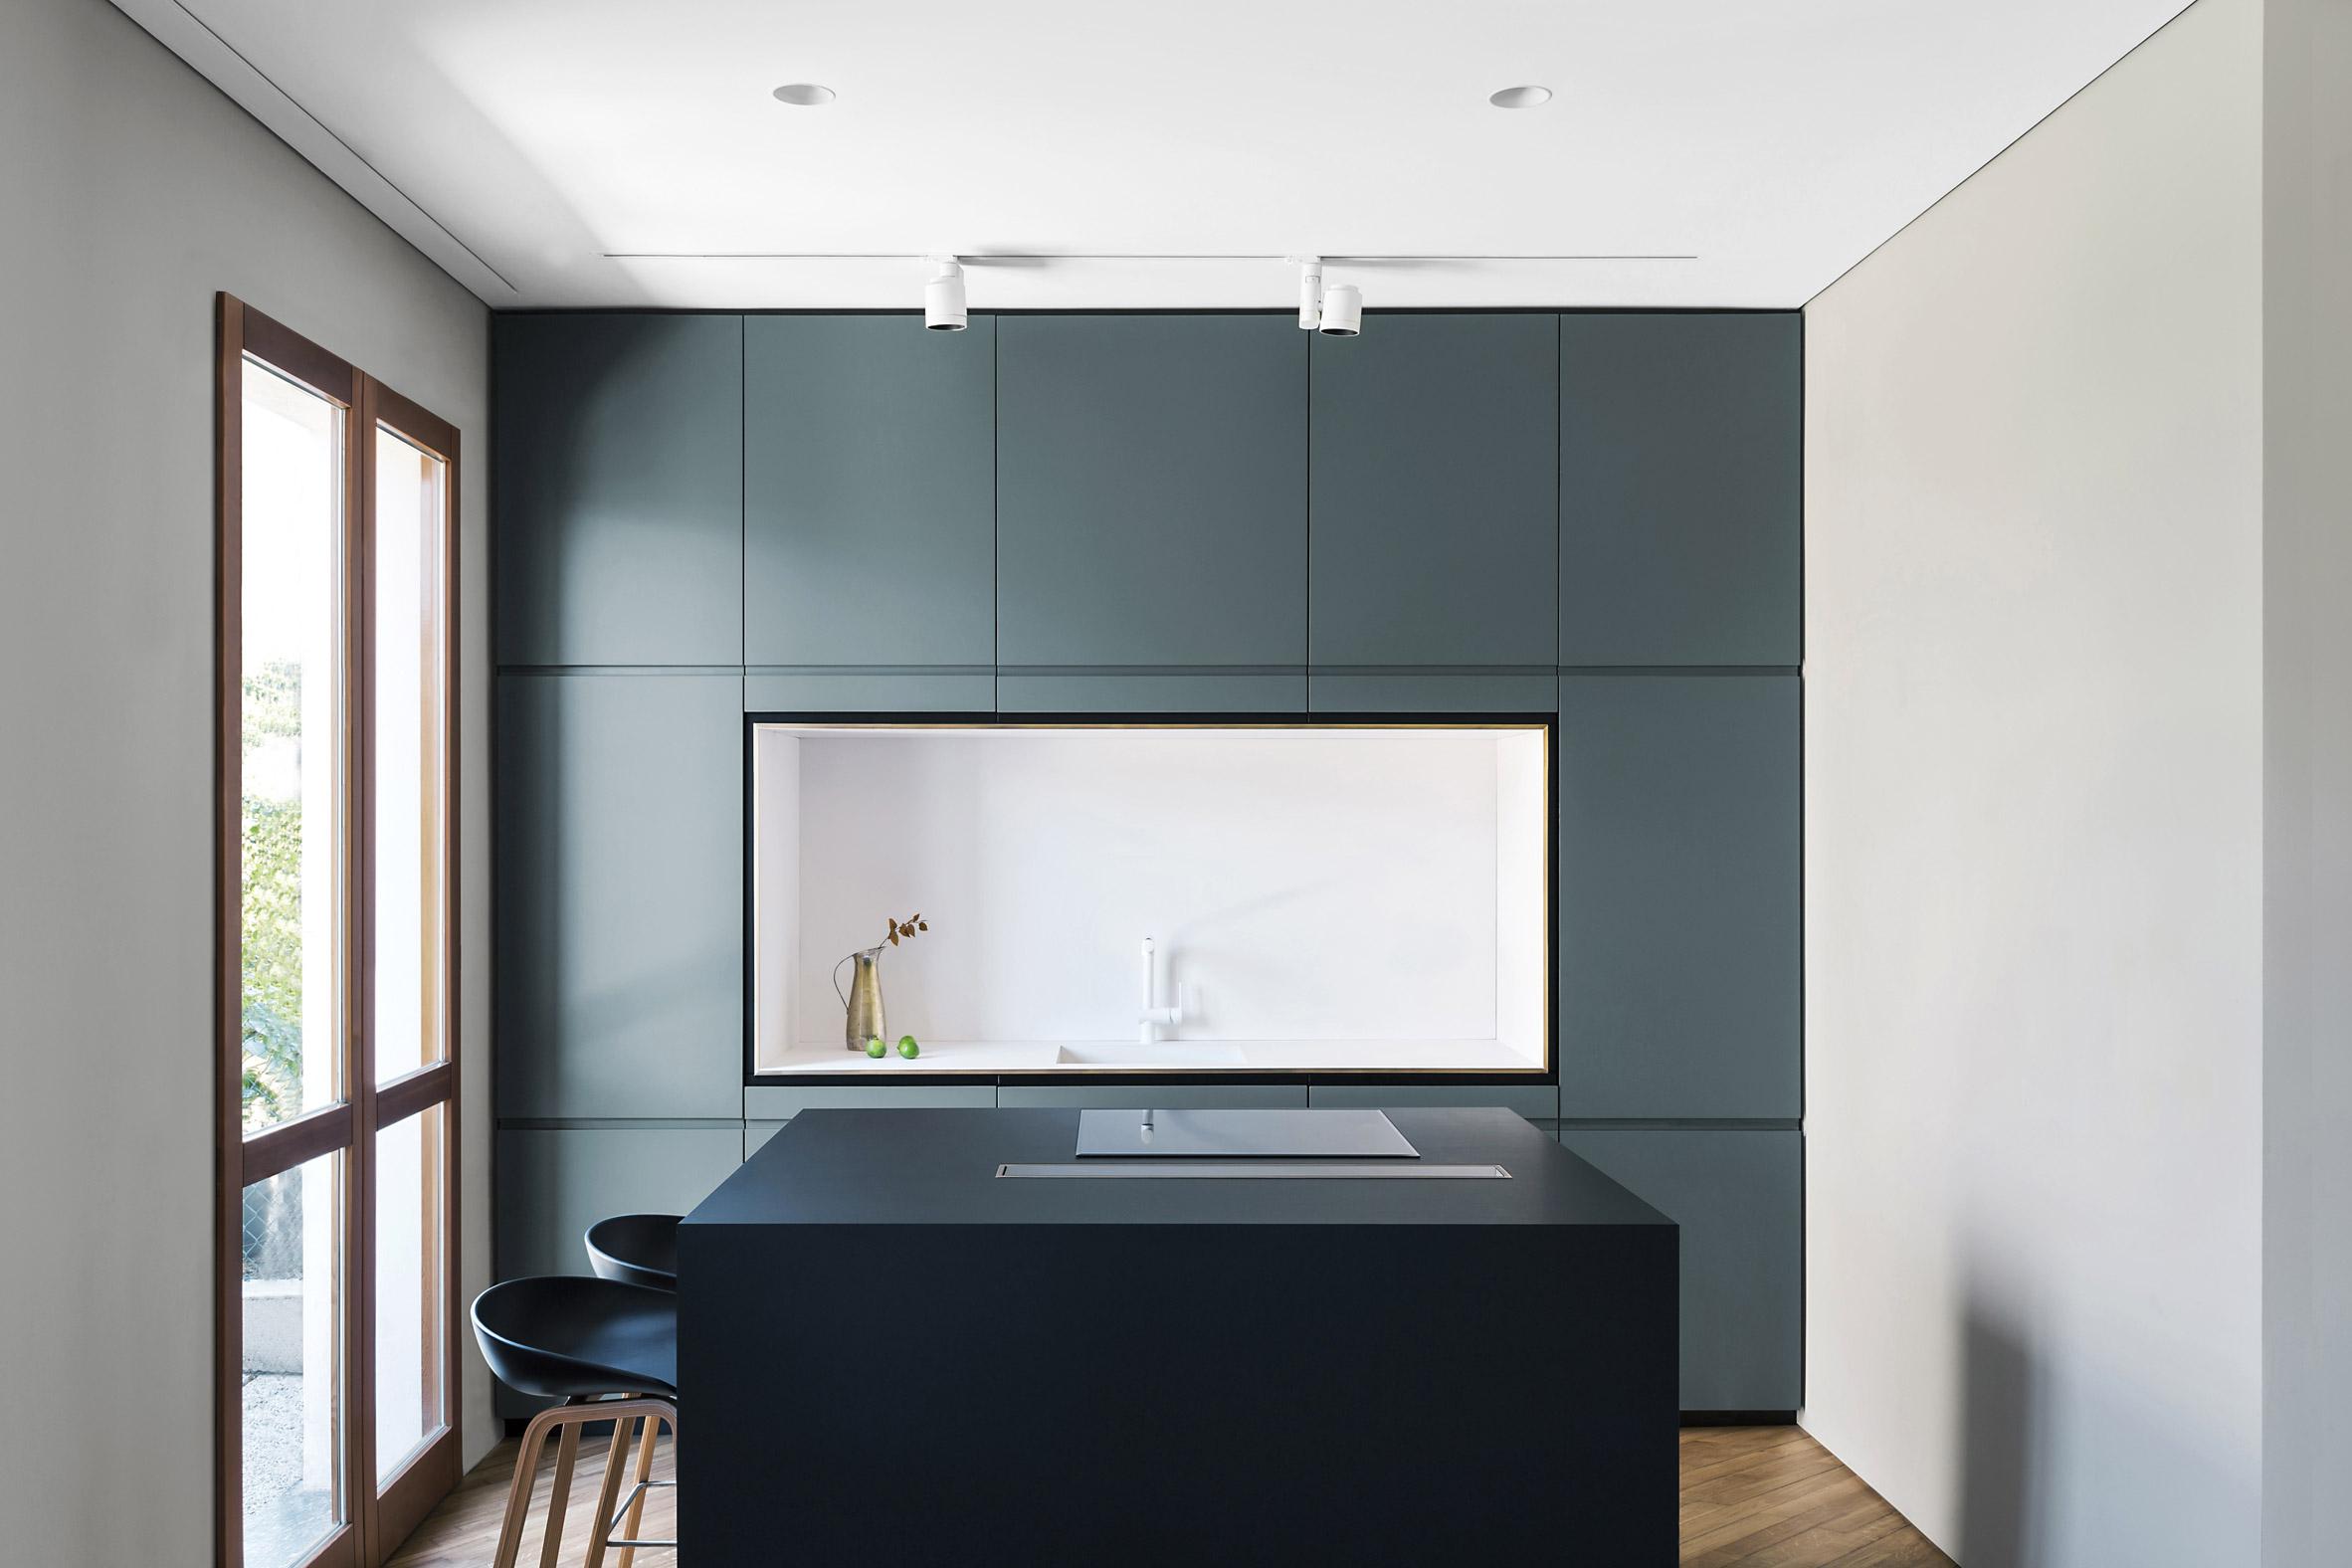 architecture-house-residential-design-studia-interiors-osnovadesign-osnova-poltava_02